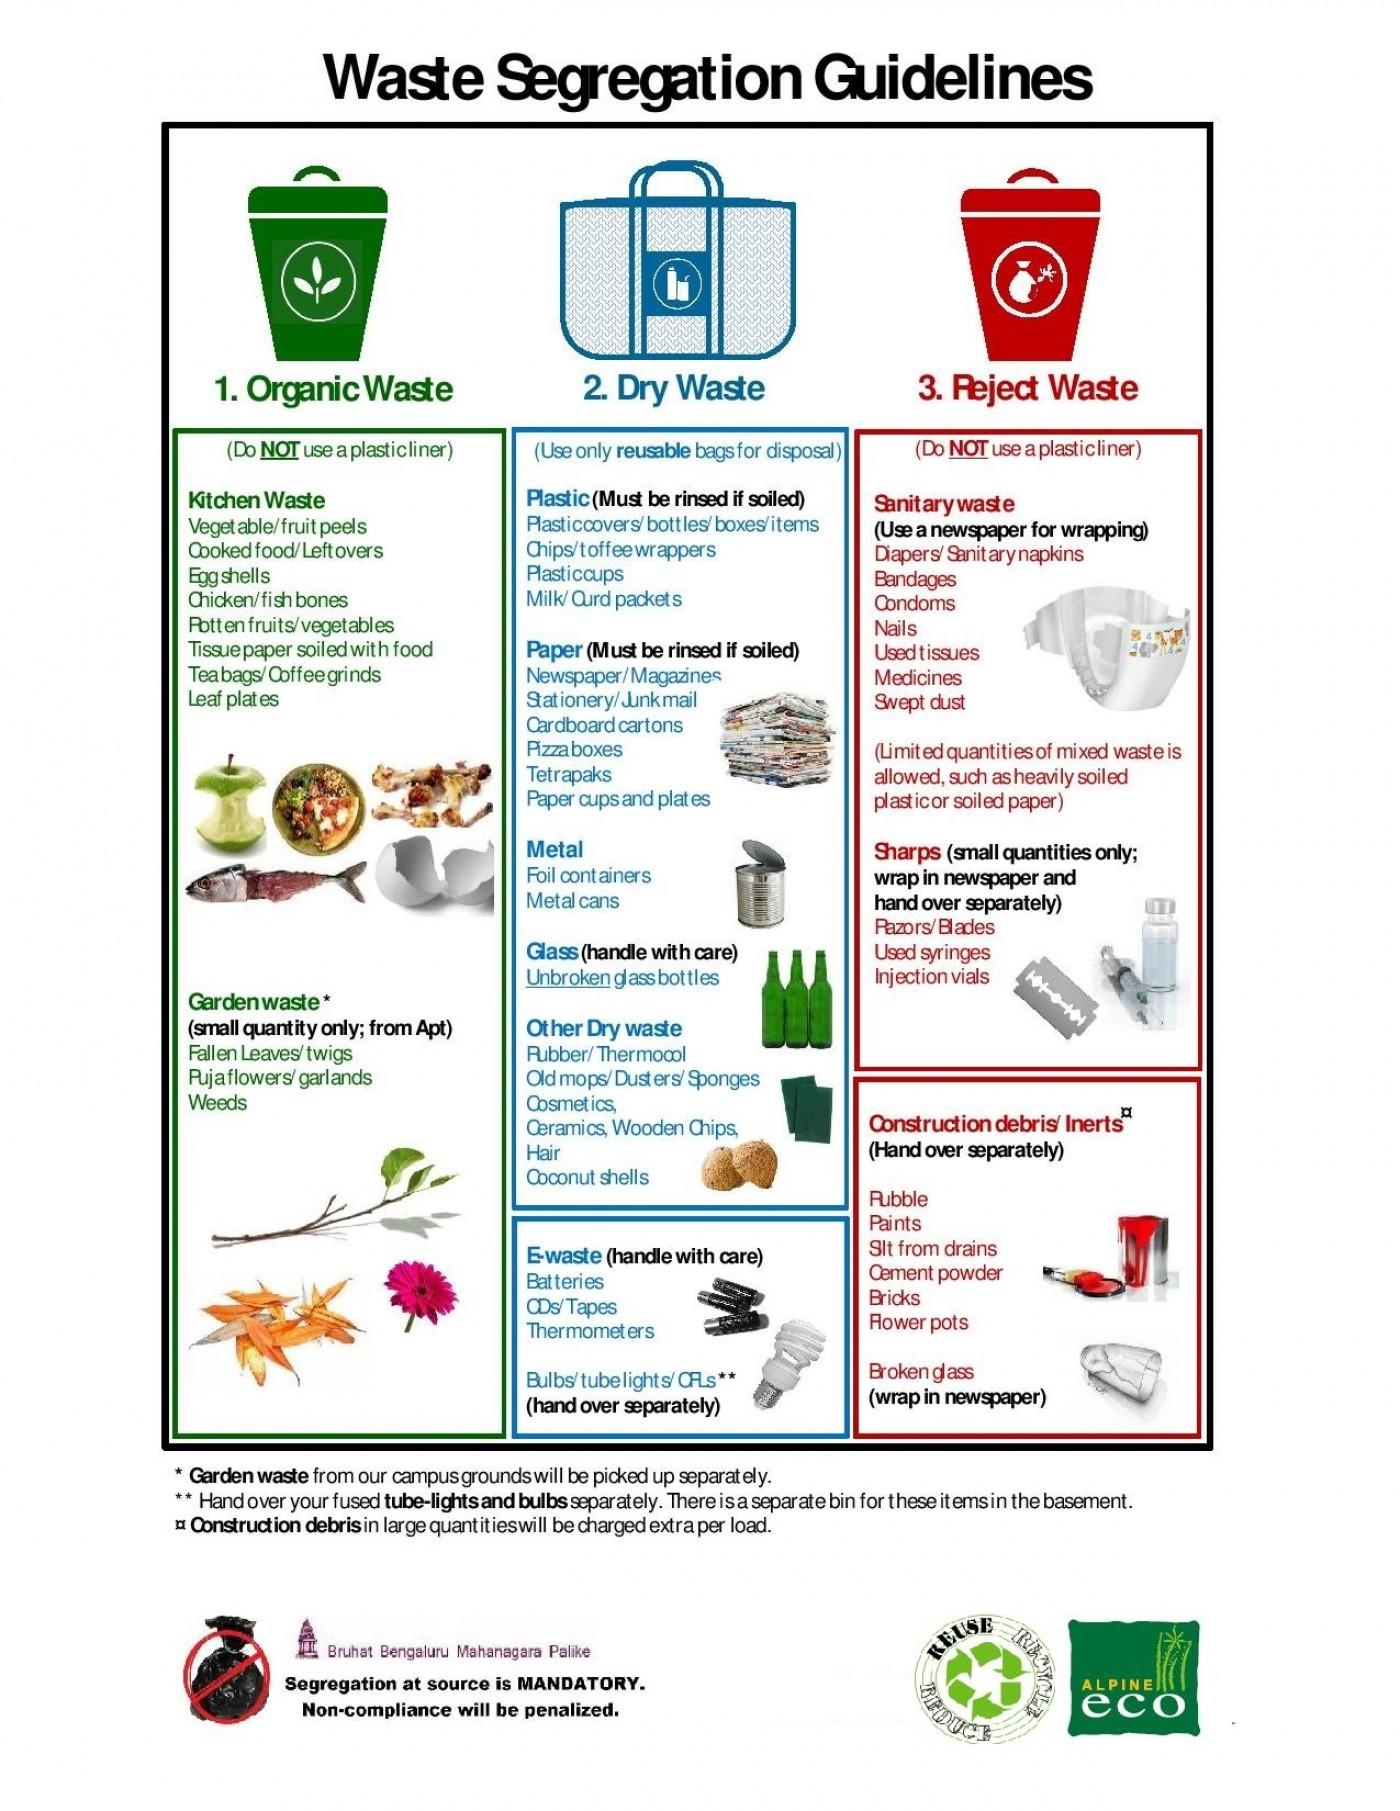 004 Essay Example20segregation20handout Segregating Fascinating Waste Introduction In School 1400